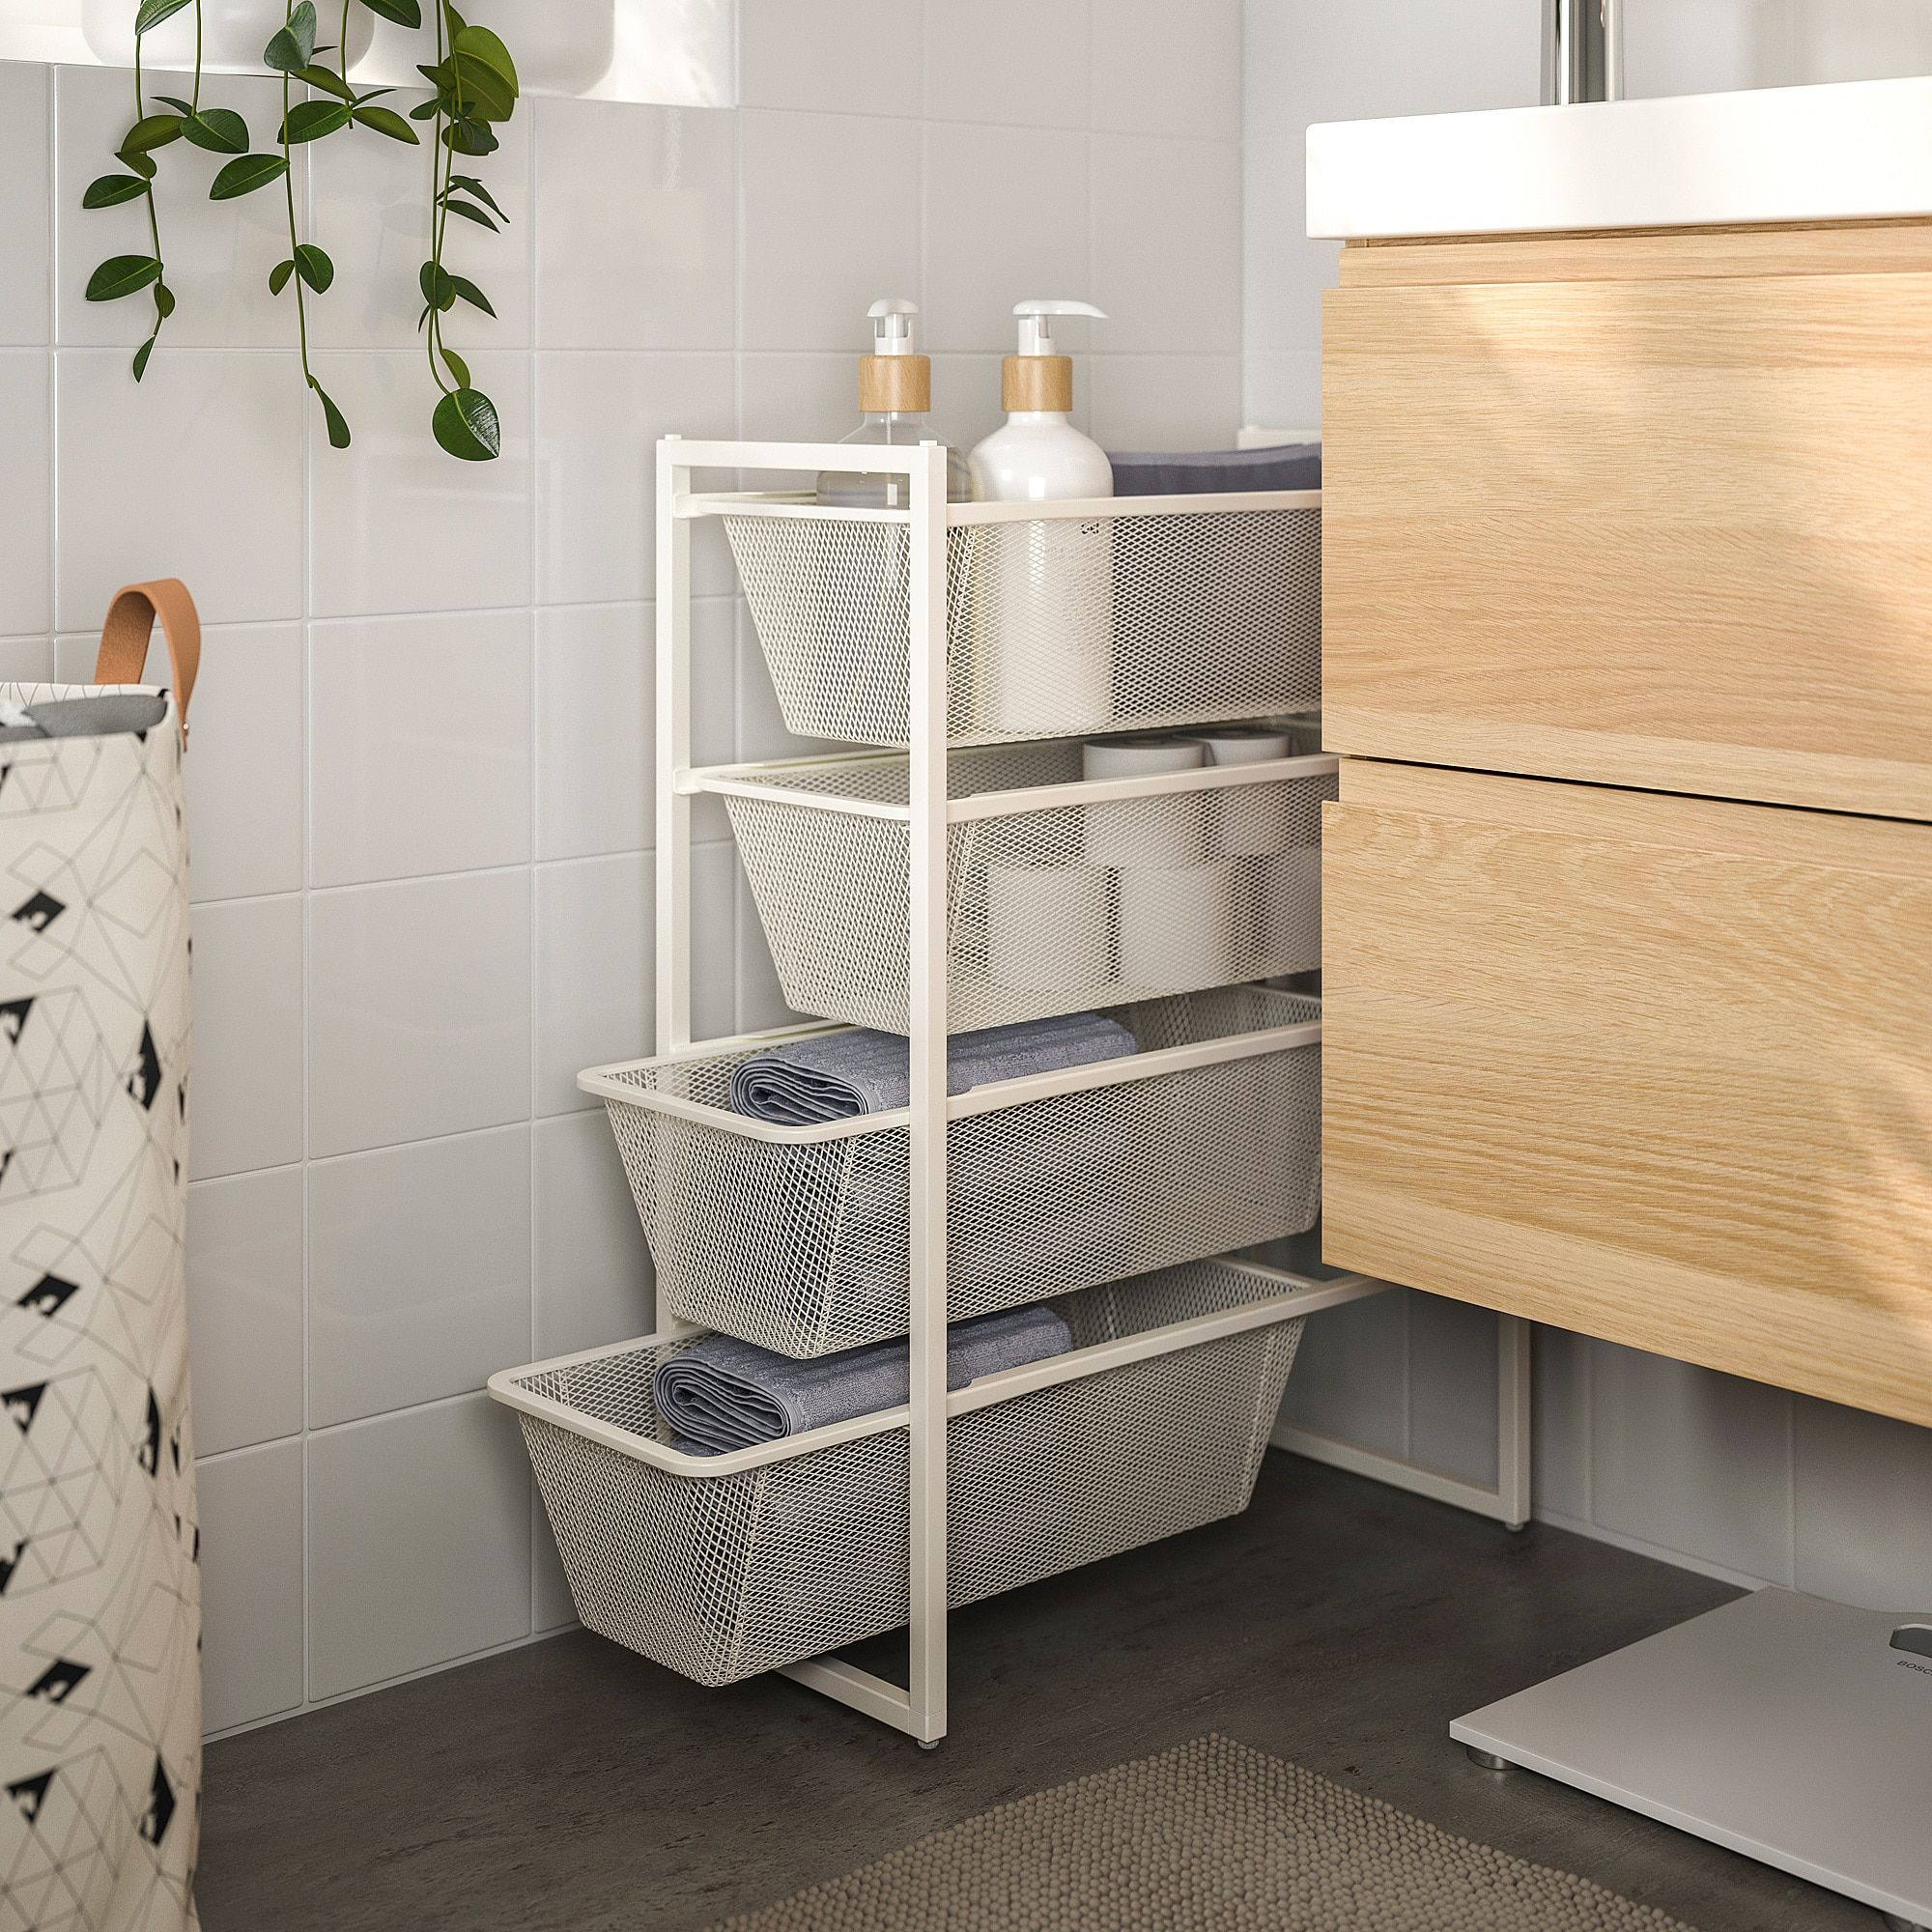 Jonaxel Rahmen Mit Netzdrahtkorben Ikea Osterreich Ikea Small Bathroom Storage Shelving